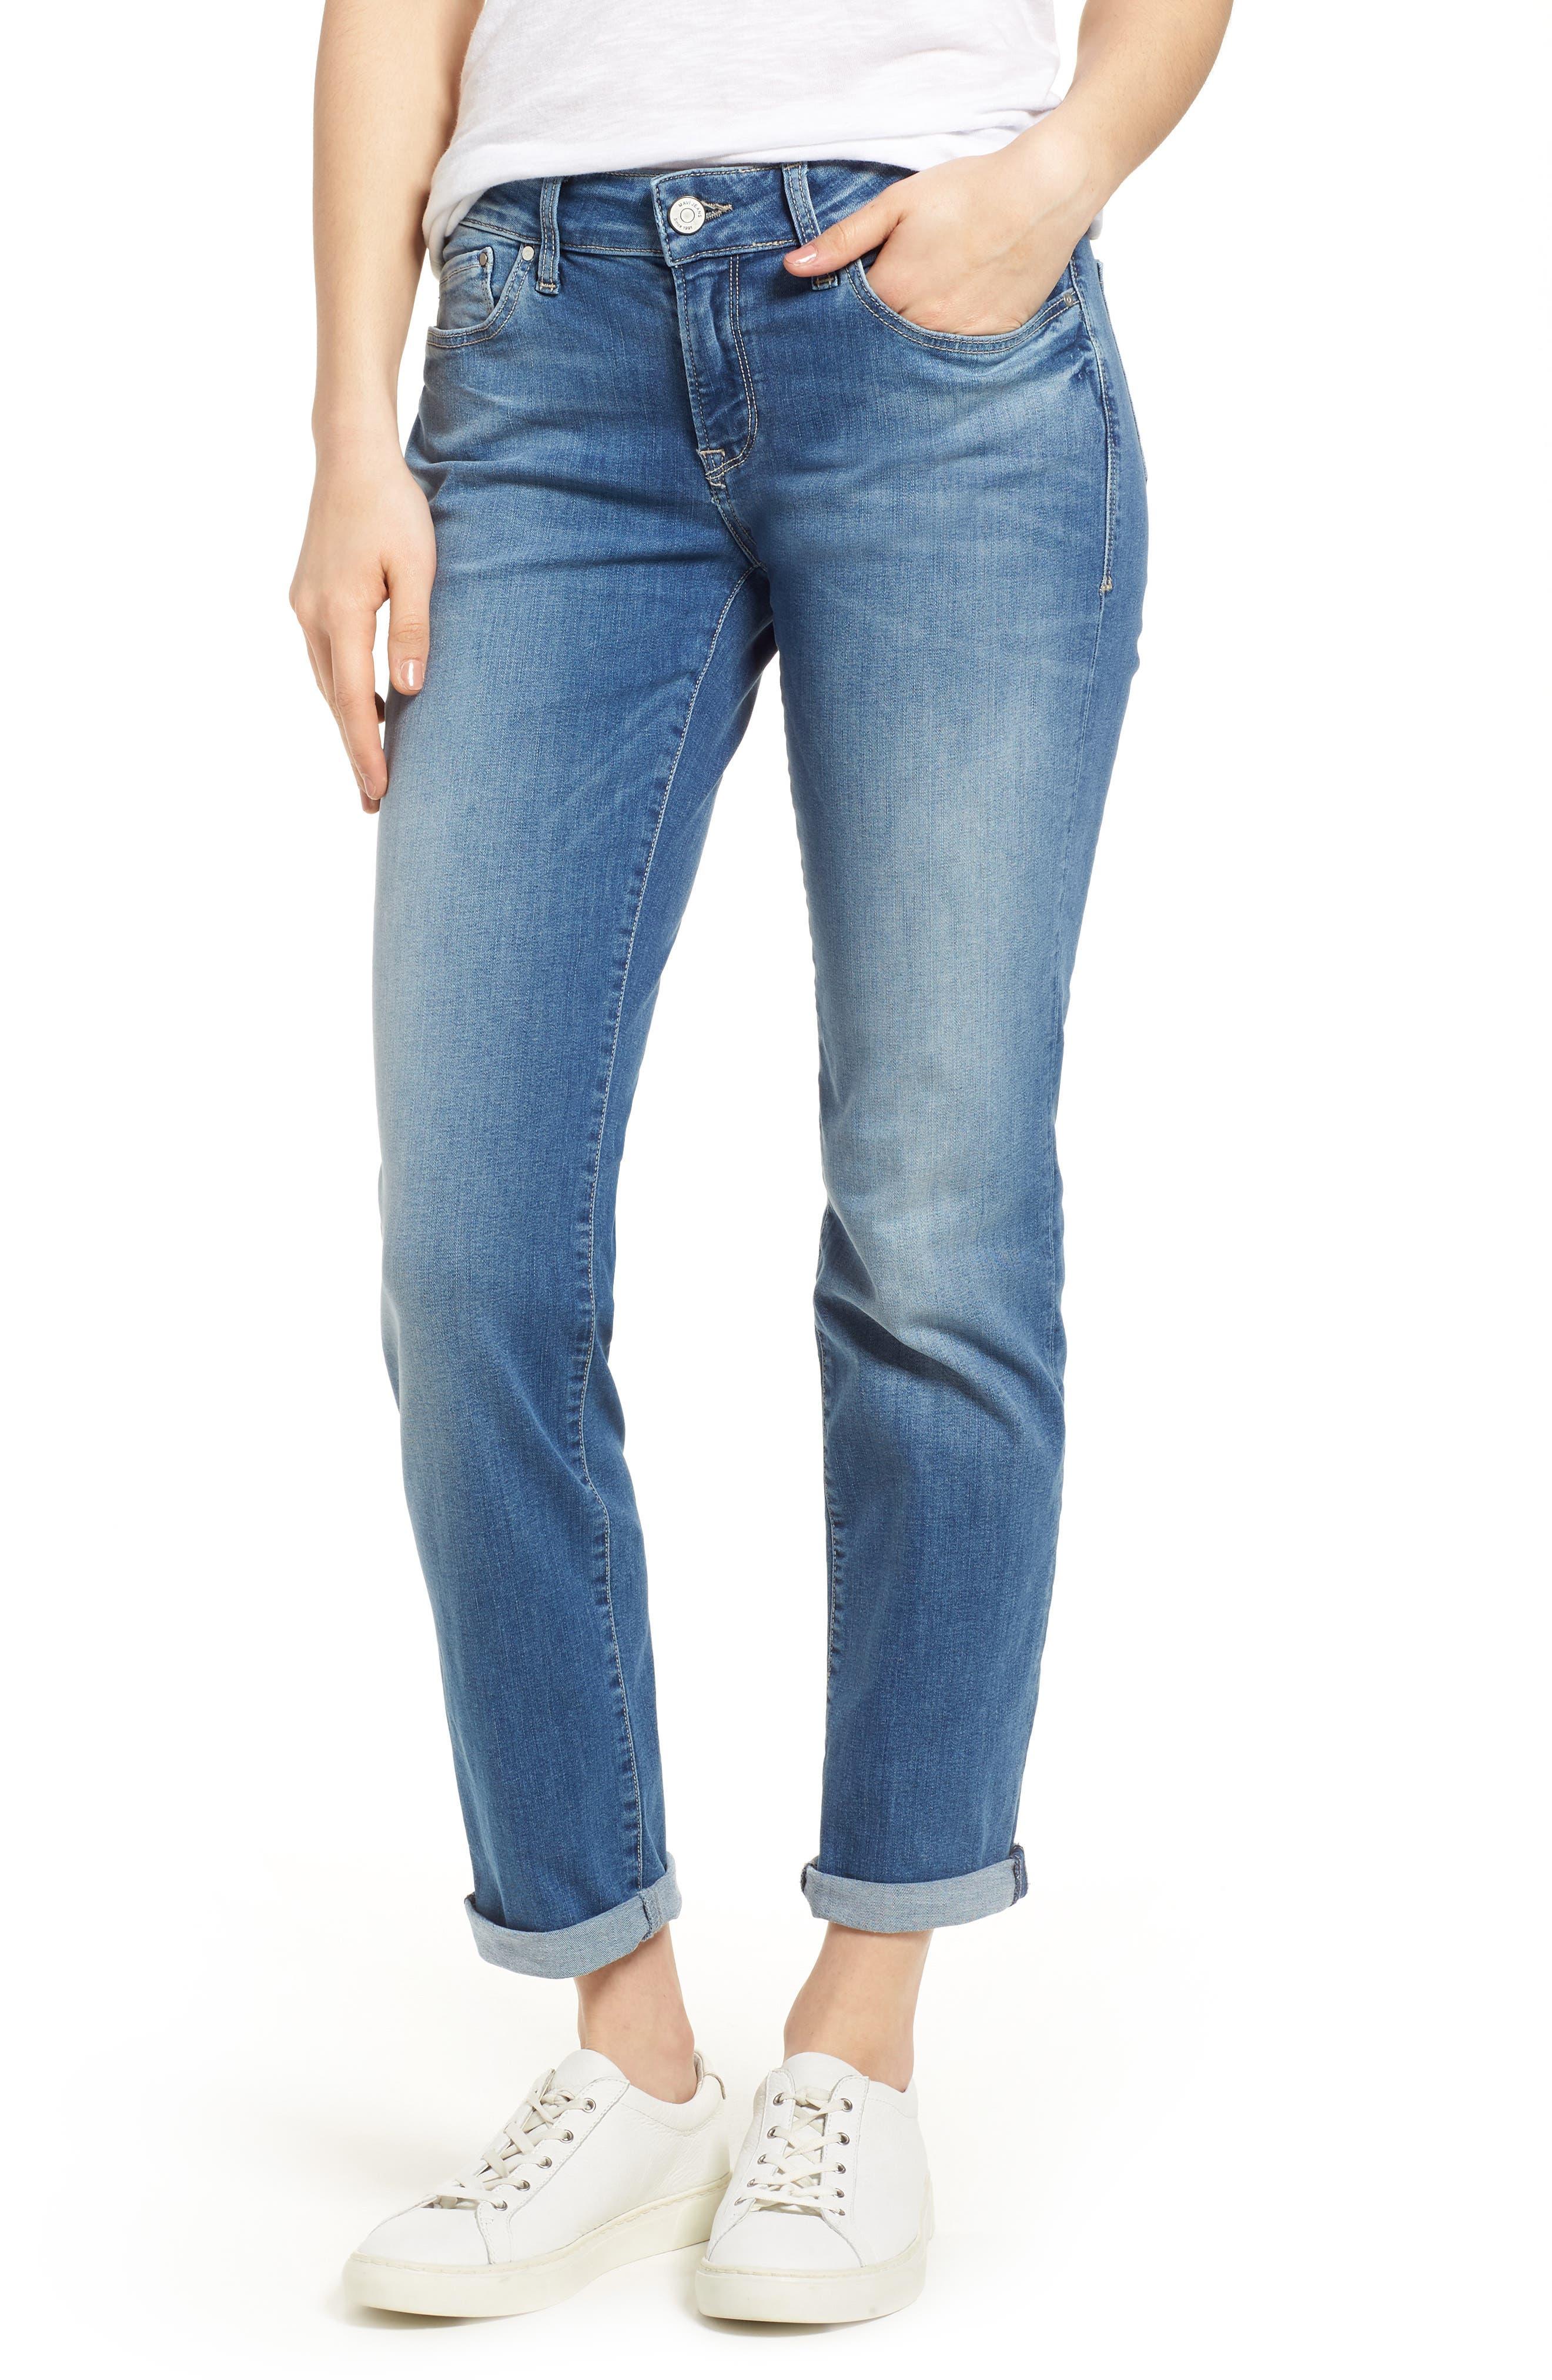 MAVI JEANS, Emma Slim Boyfriend Jeans, Main thumbnail 1, color, INDIGO RIPPED NOLITA